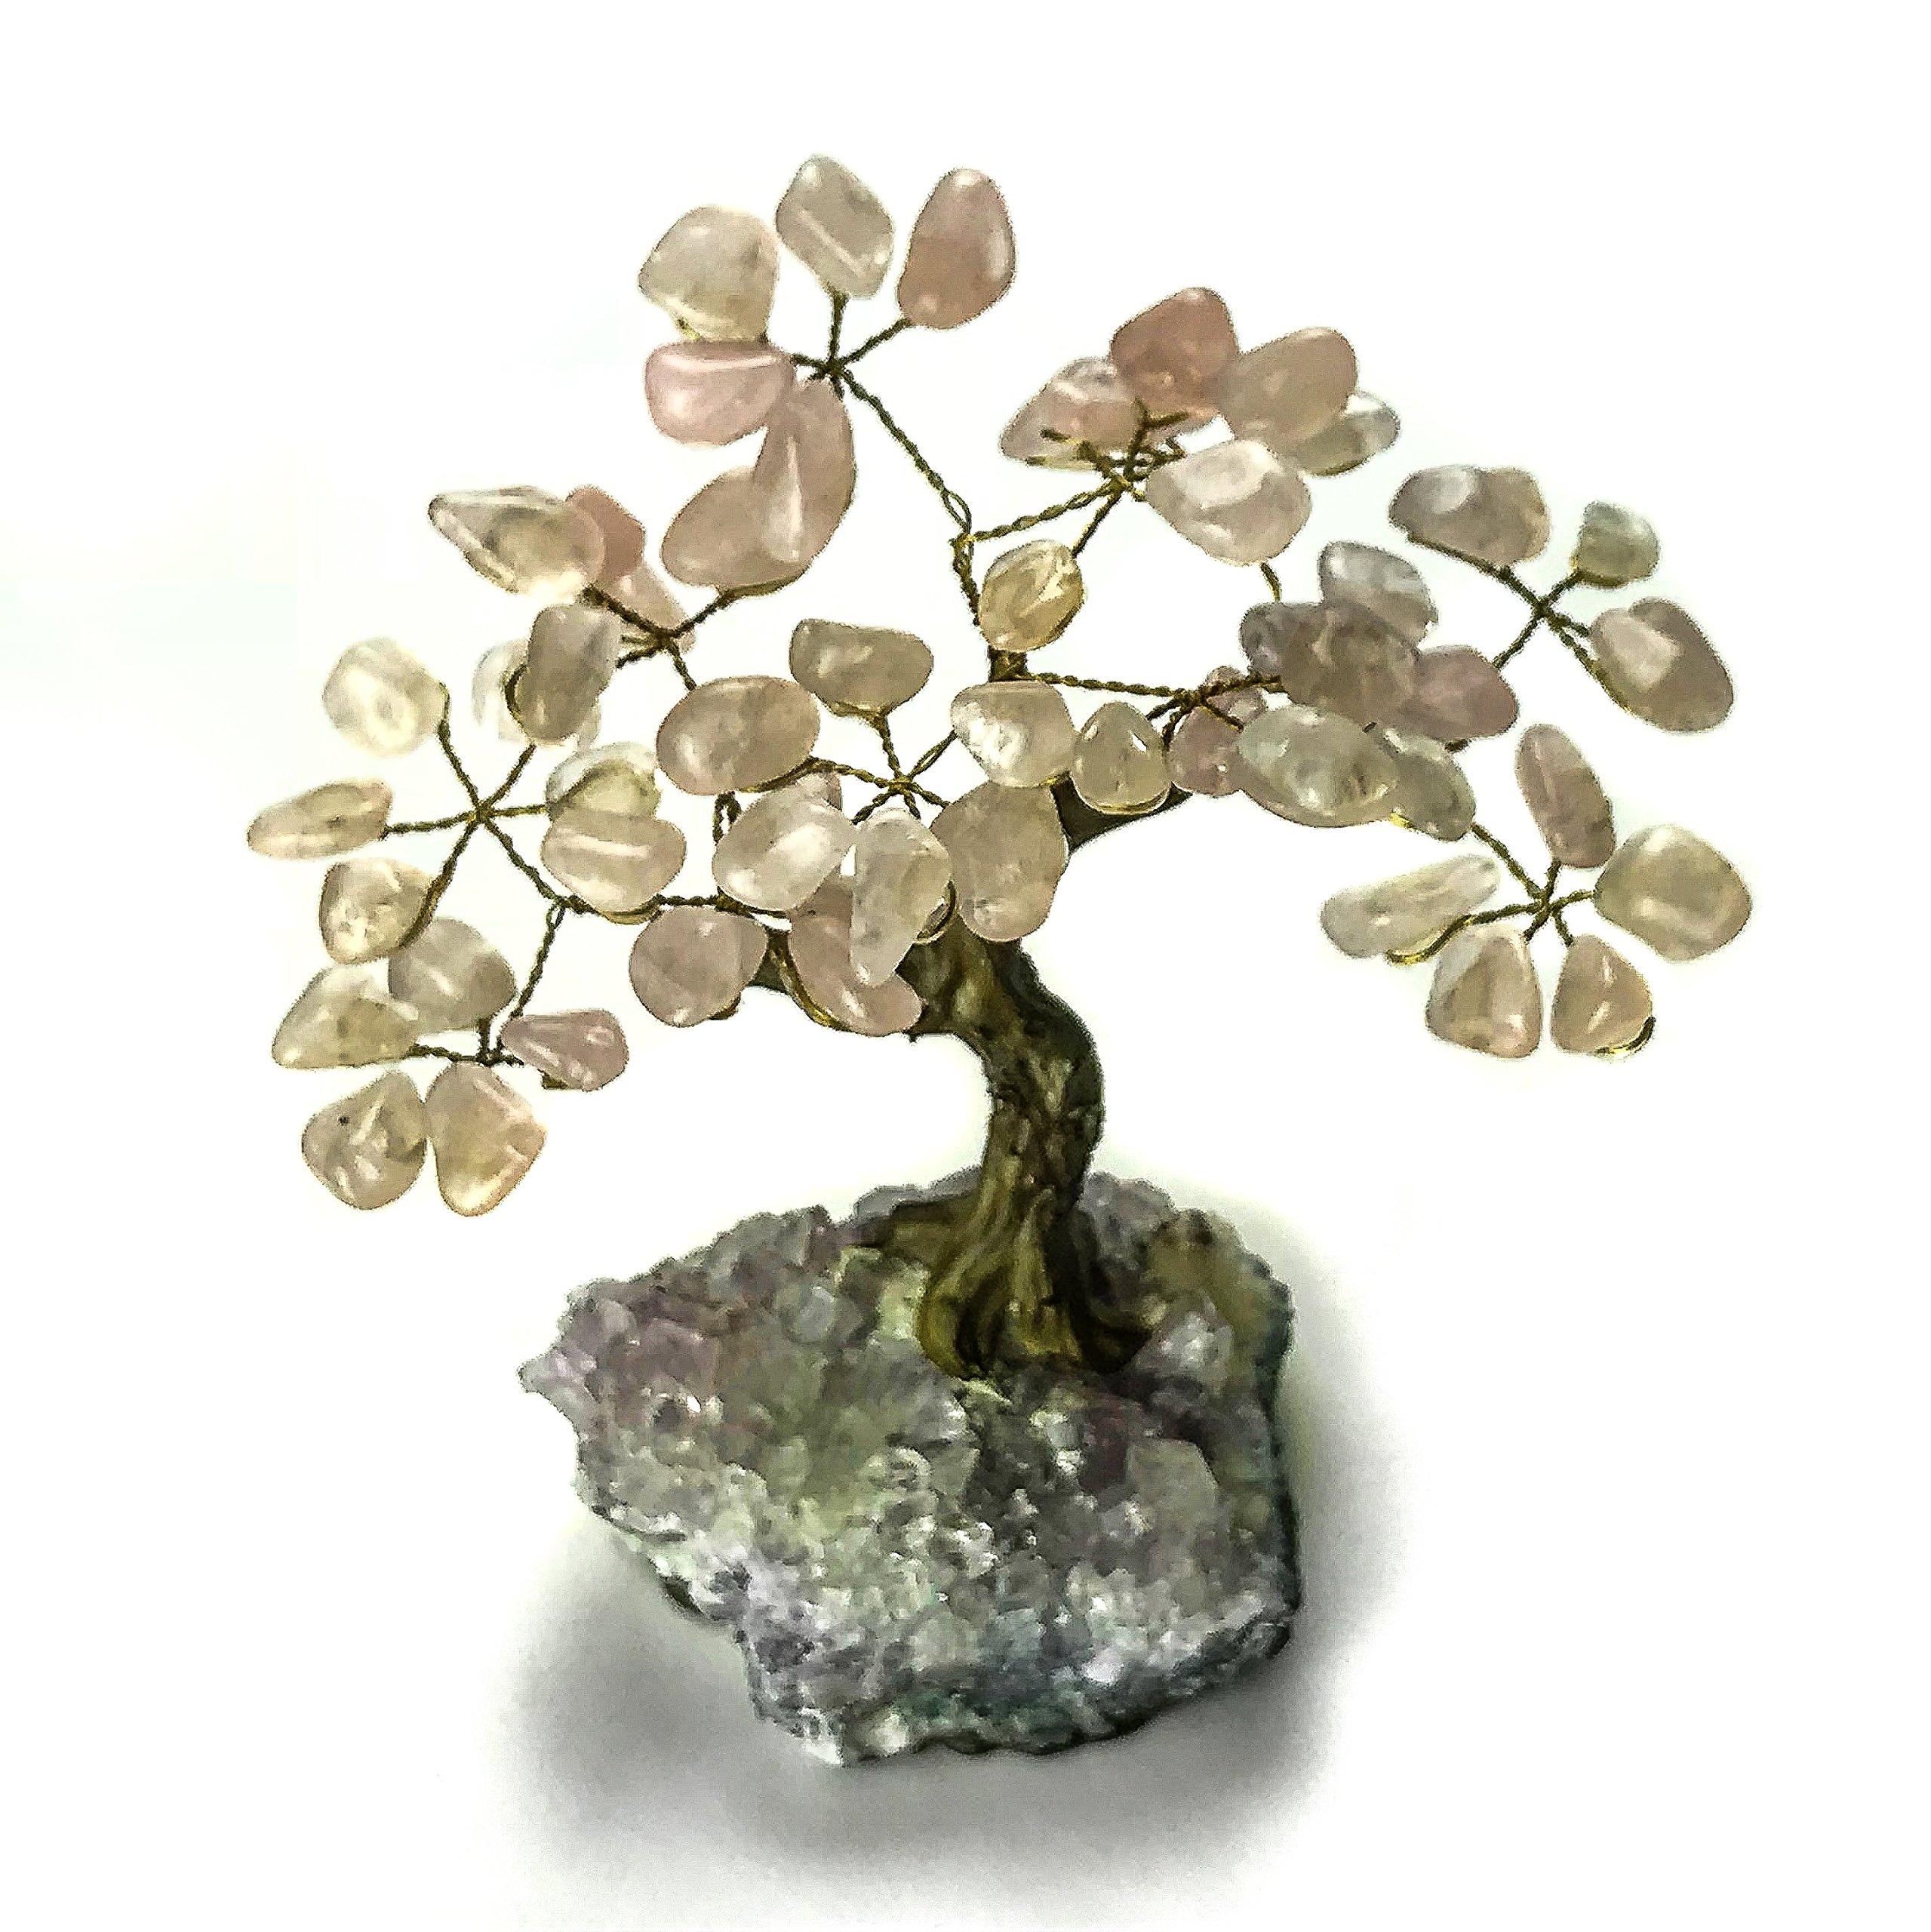 Small Rose Quartz Gemstone Tree On Amethyst Matrix